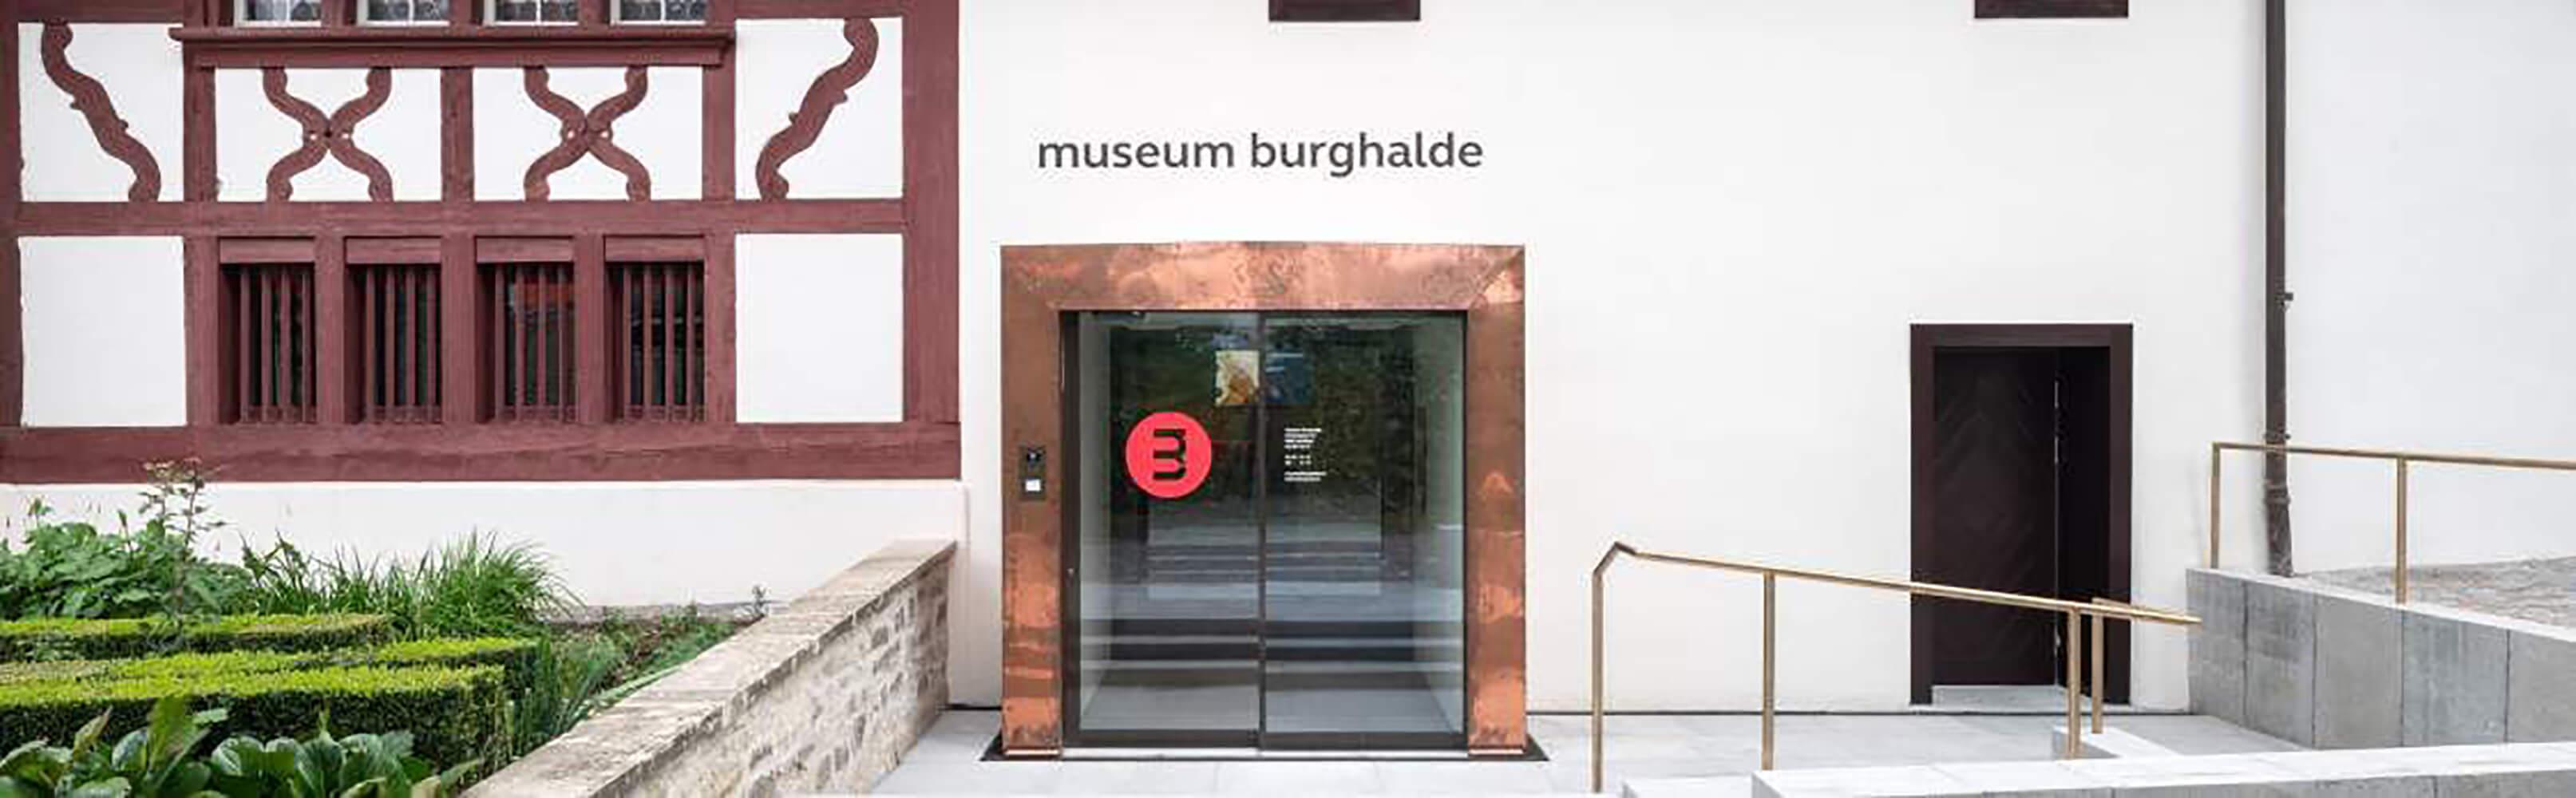 Museum Burghalde Lenzburg 1